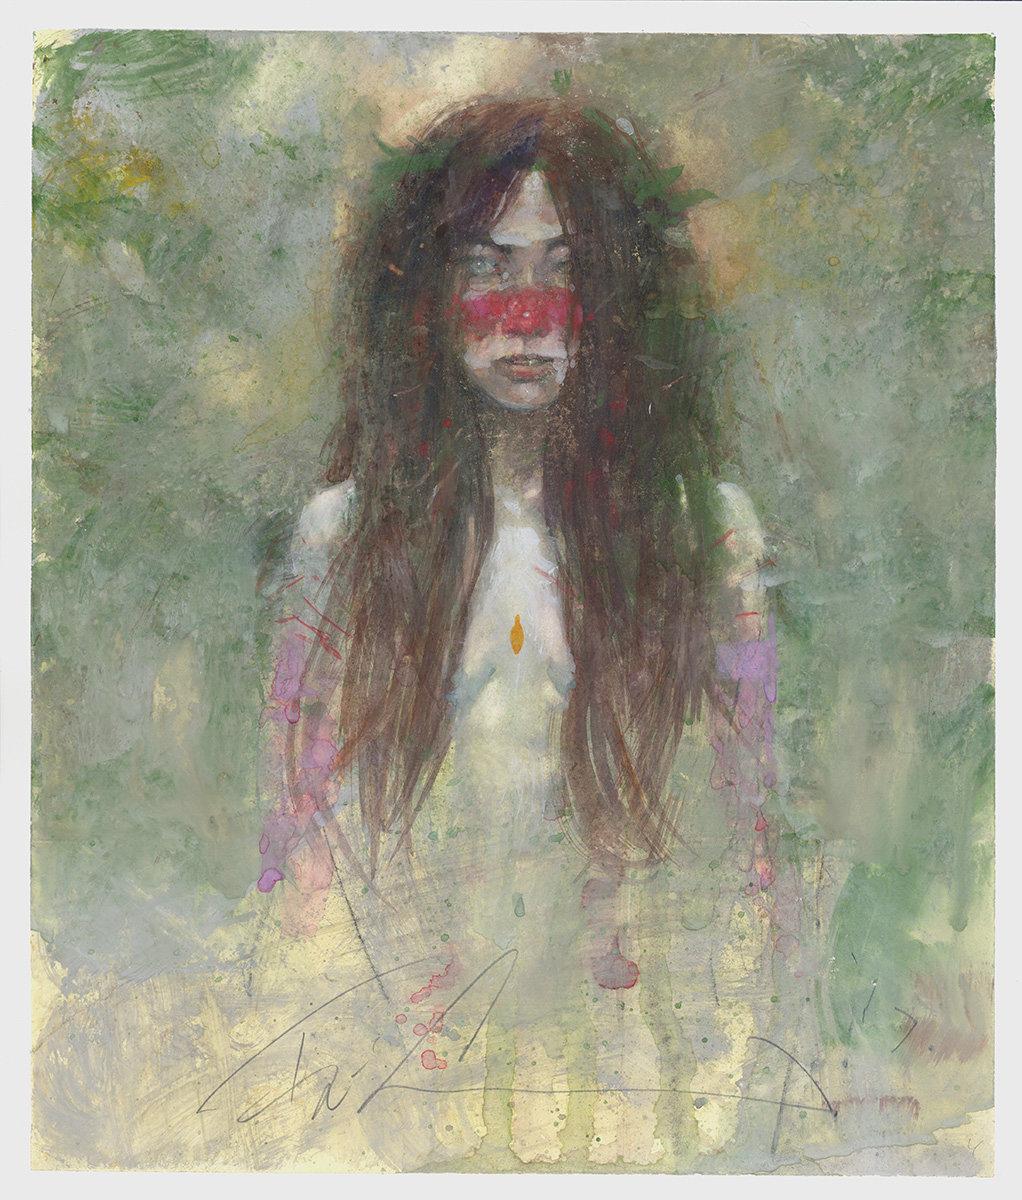 Spearwomen painting 6-2017 NONE 100dpi.jpg